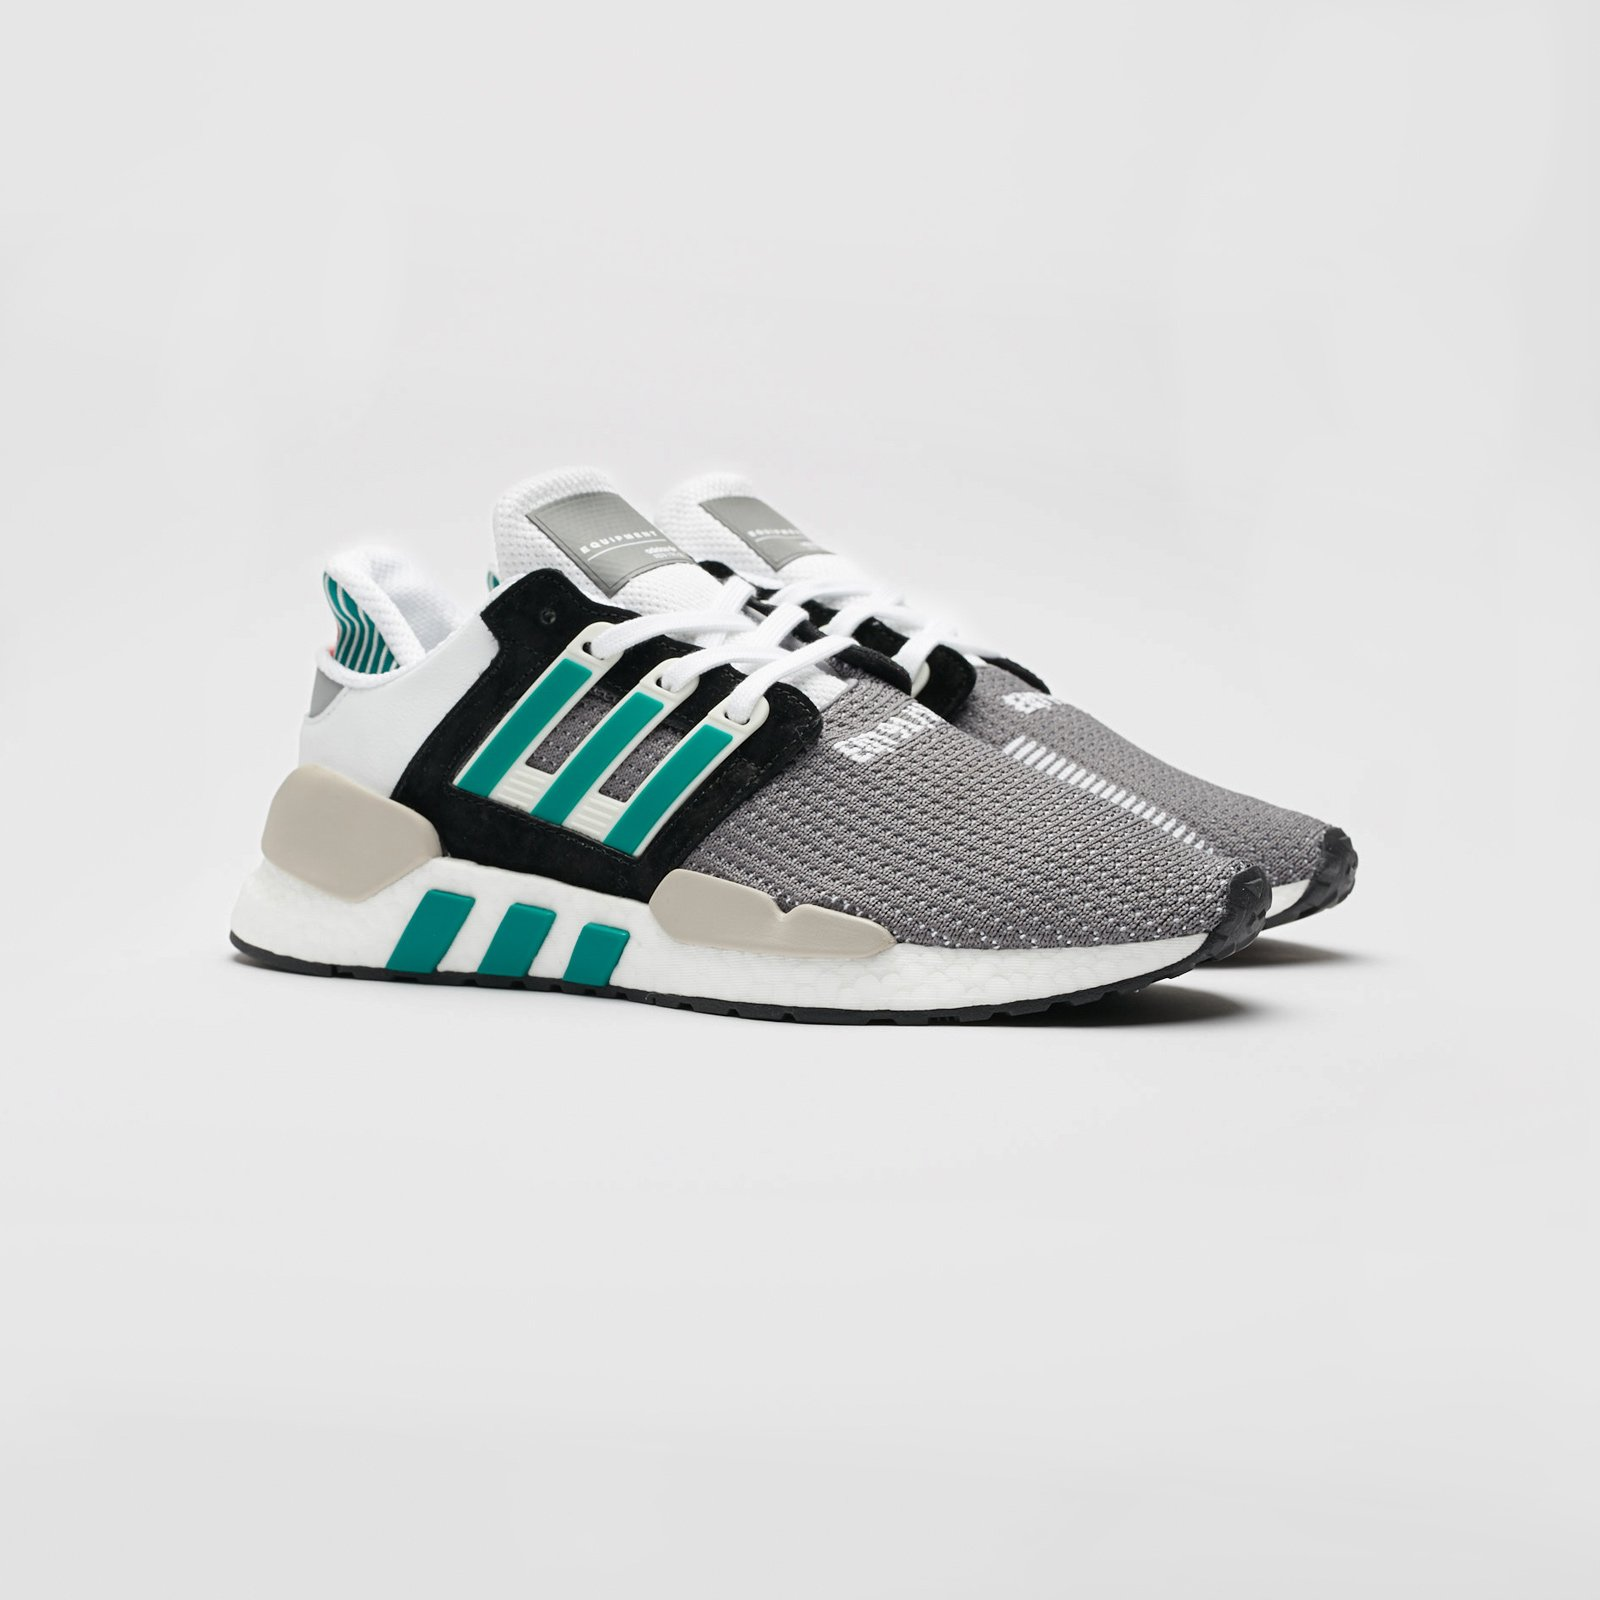 adidas EQT SUPPORT 91 18 - Aq1037 - Sneakersnstuff  33ffbd37e